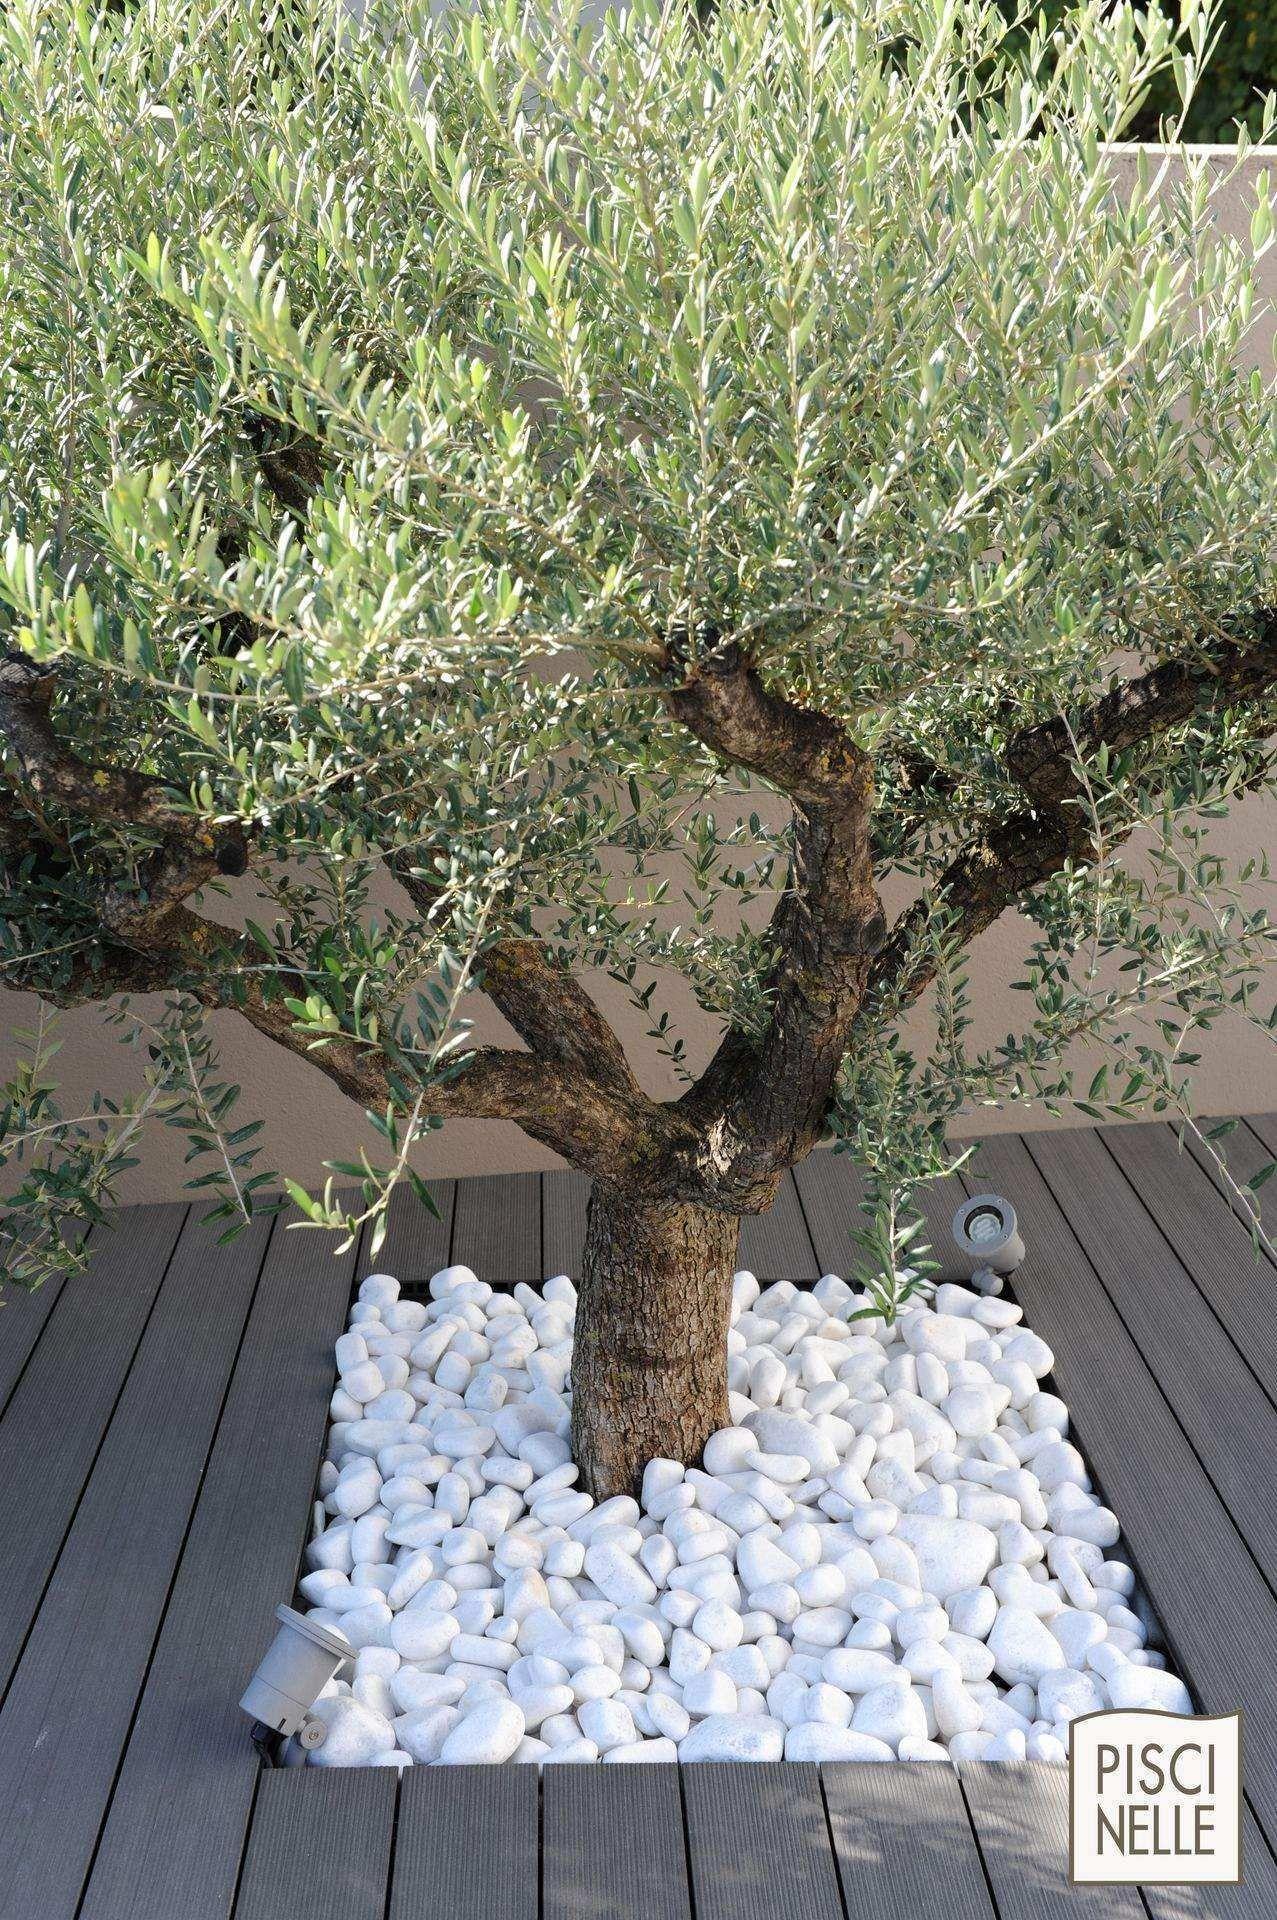 Idee Deco Jardin Avec Olivier | Idee Deco Jardin, Déco ... dedans Idee Deco Jardin